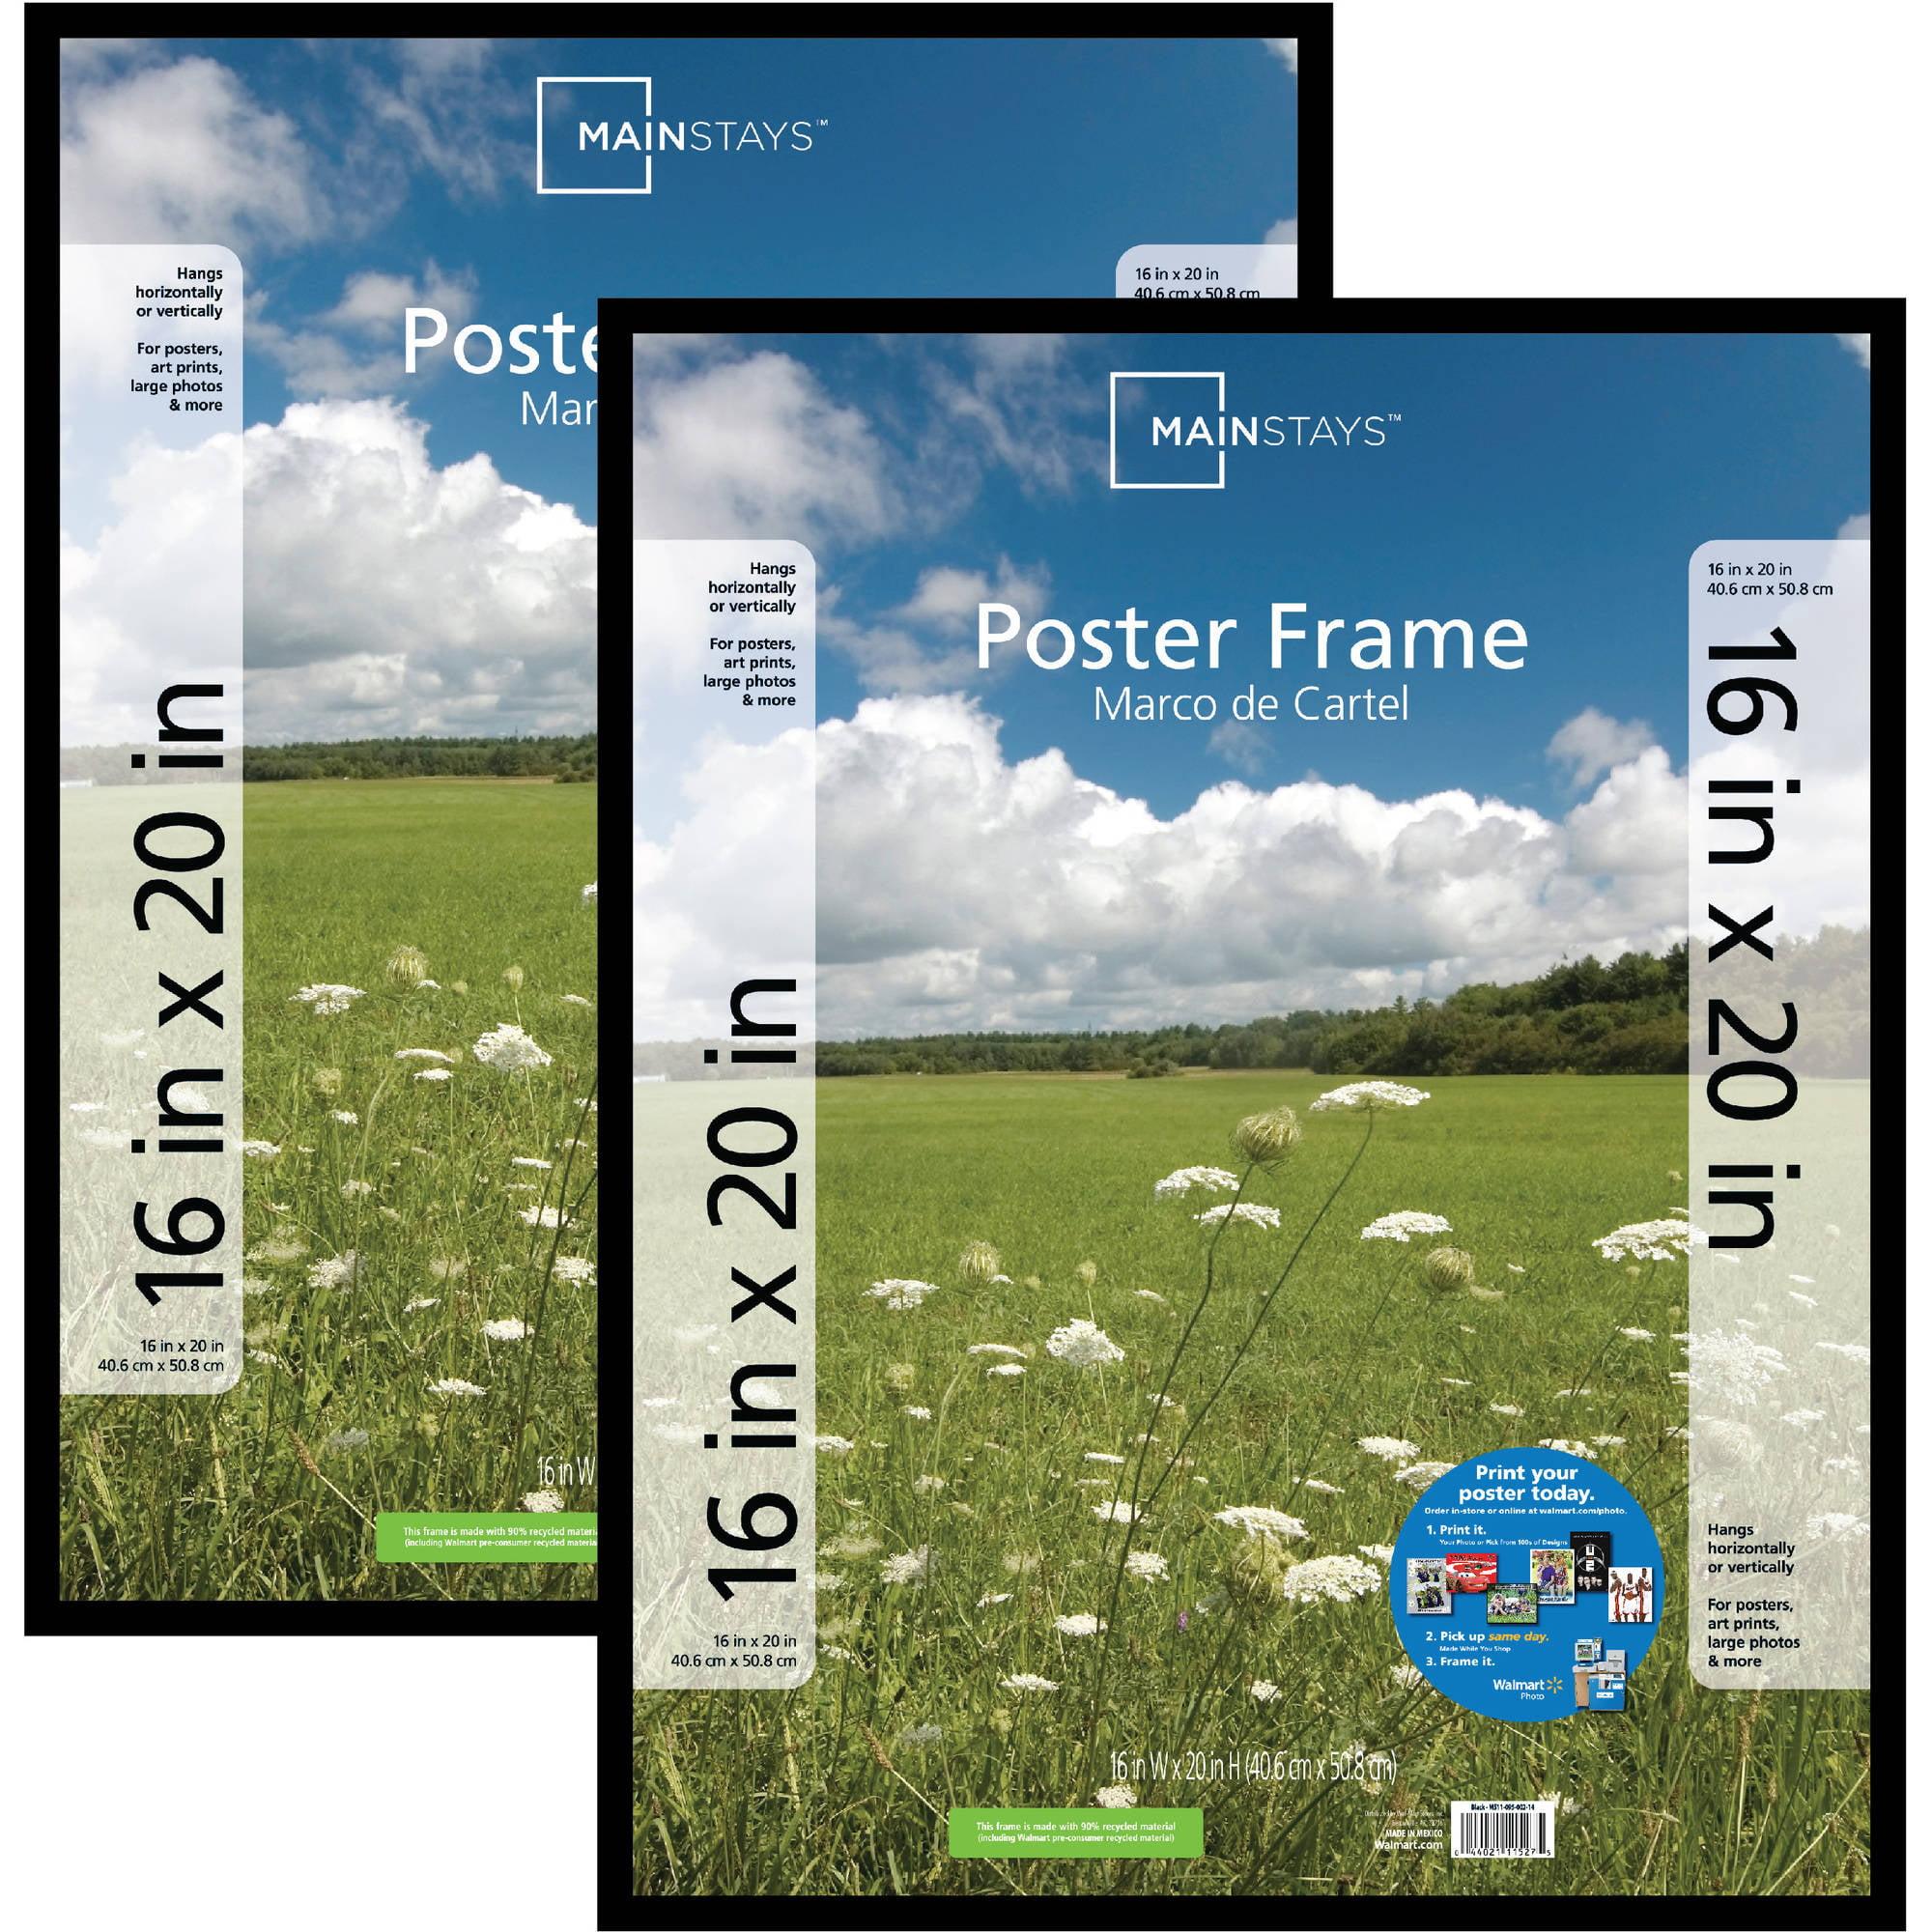 16x20 Poster Size Comparison